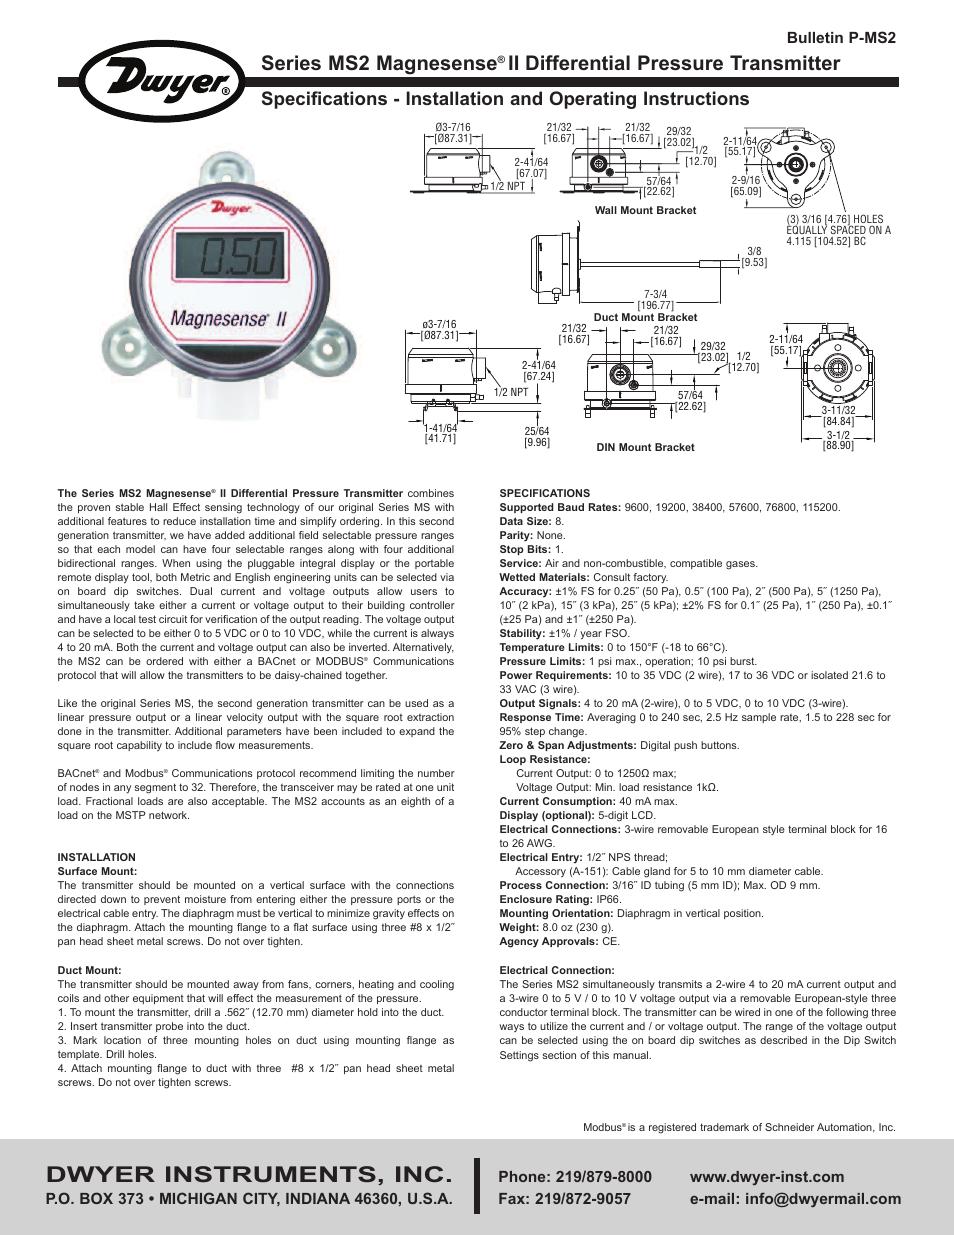 Dwyer MS2-W101-LCD Pressure Transducer